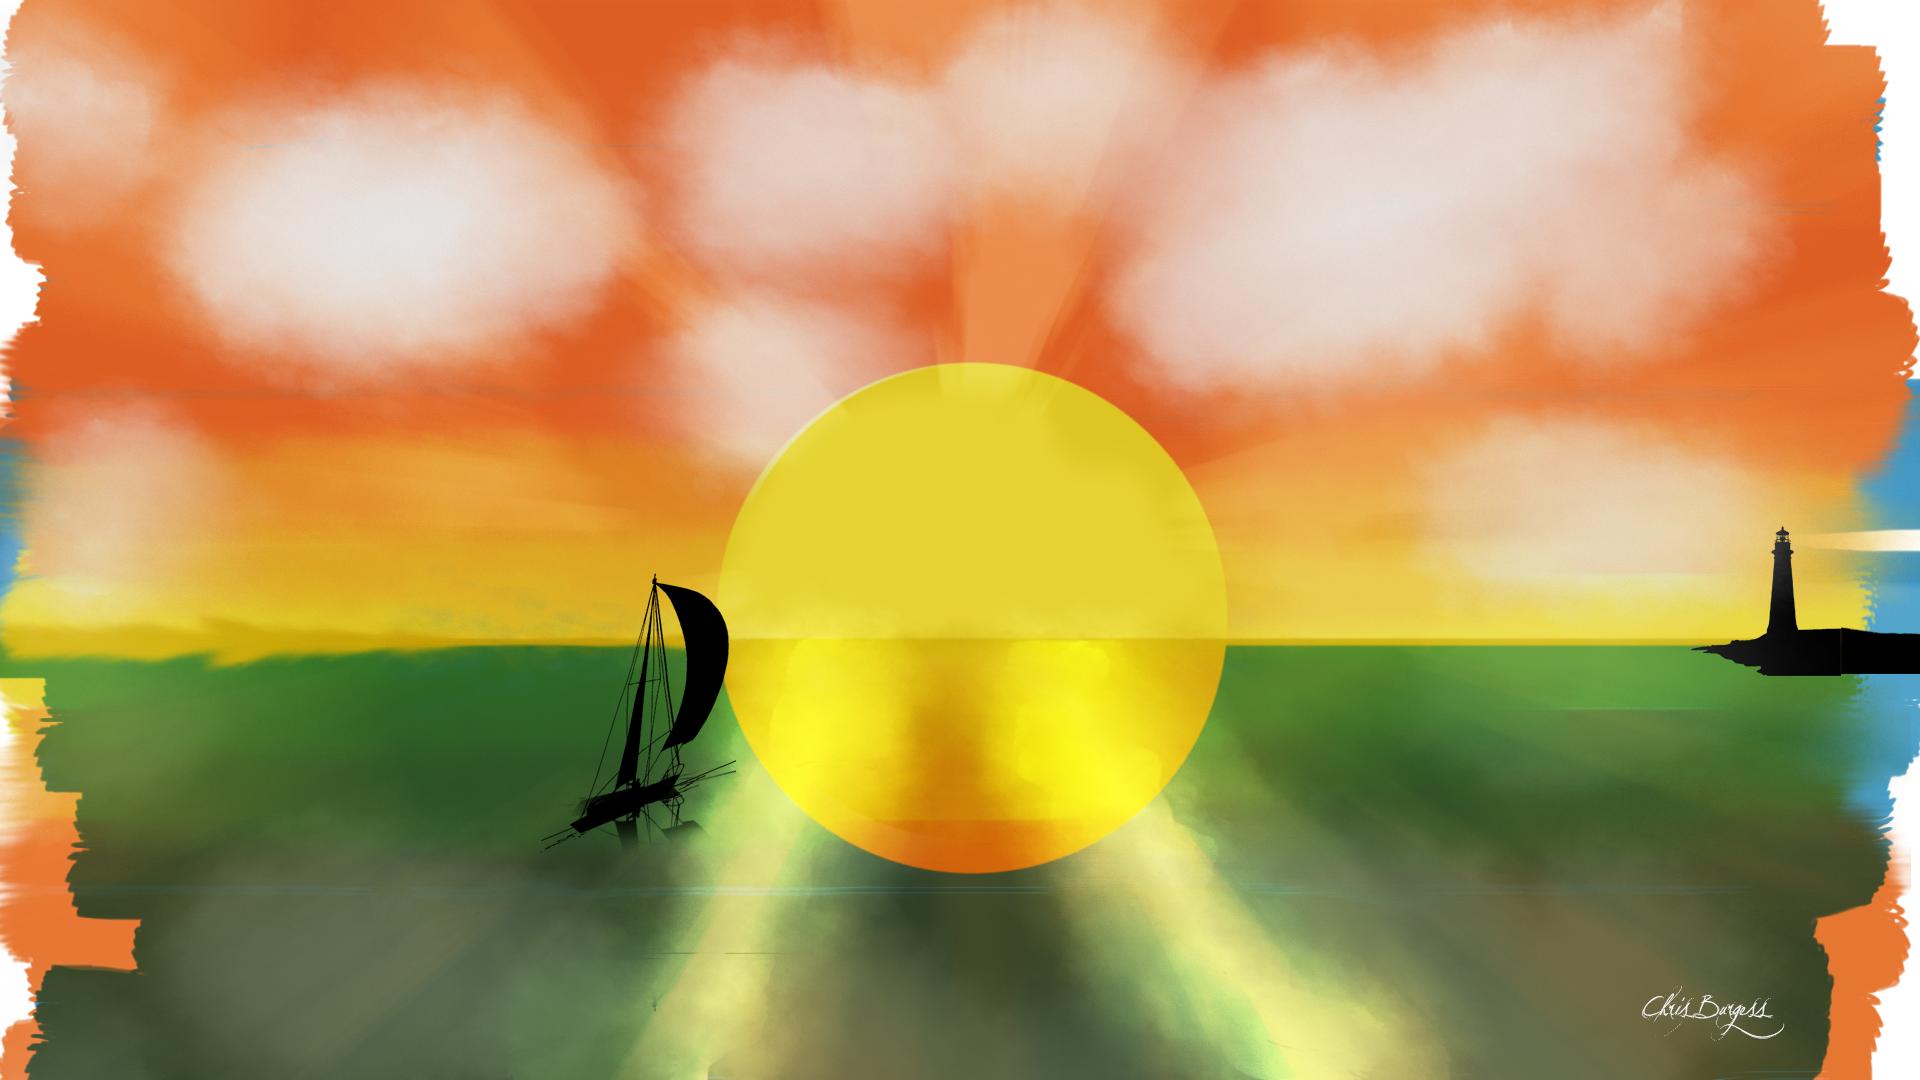 The Sun's Kiss